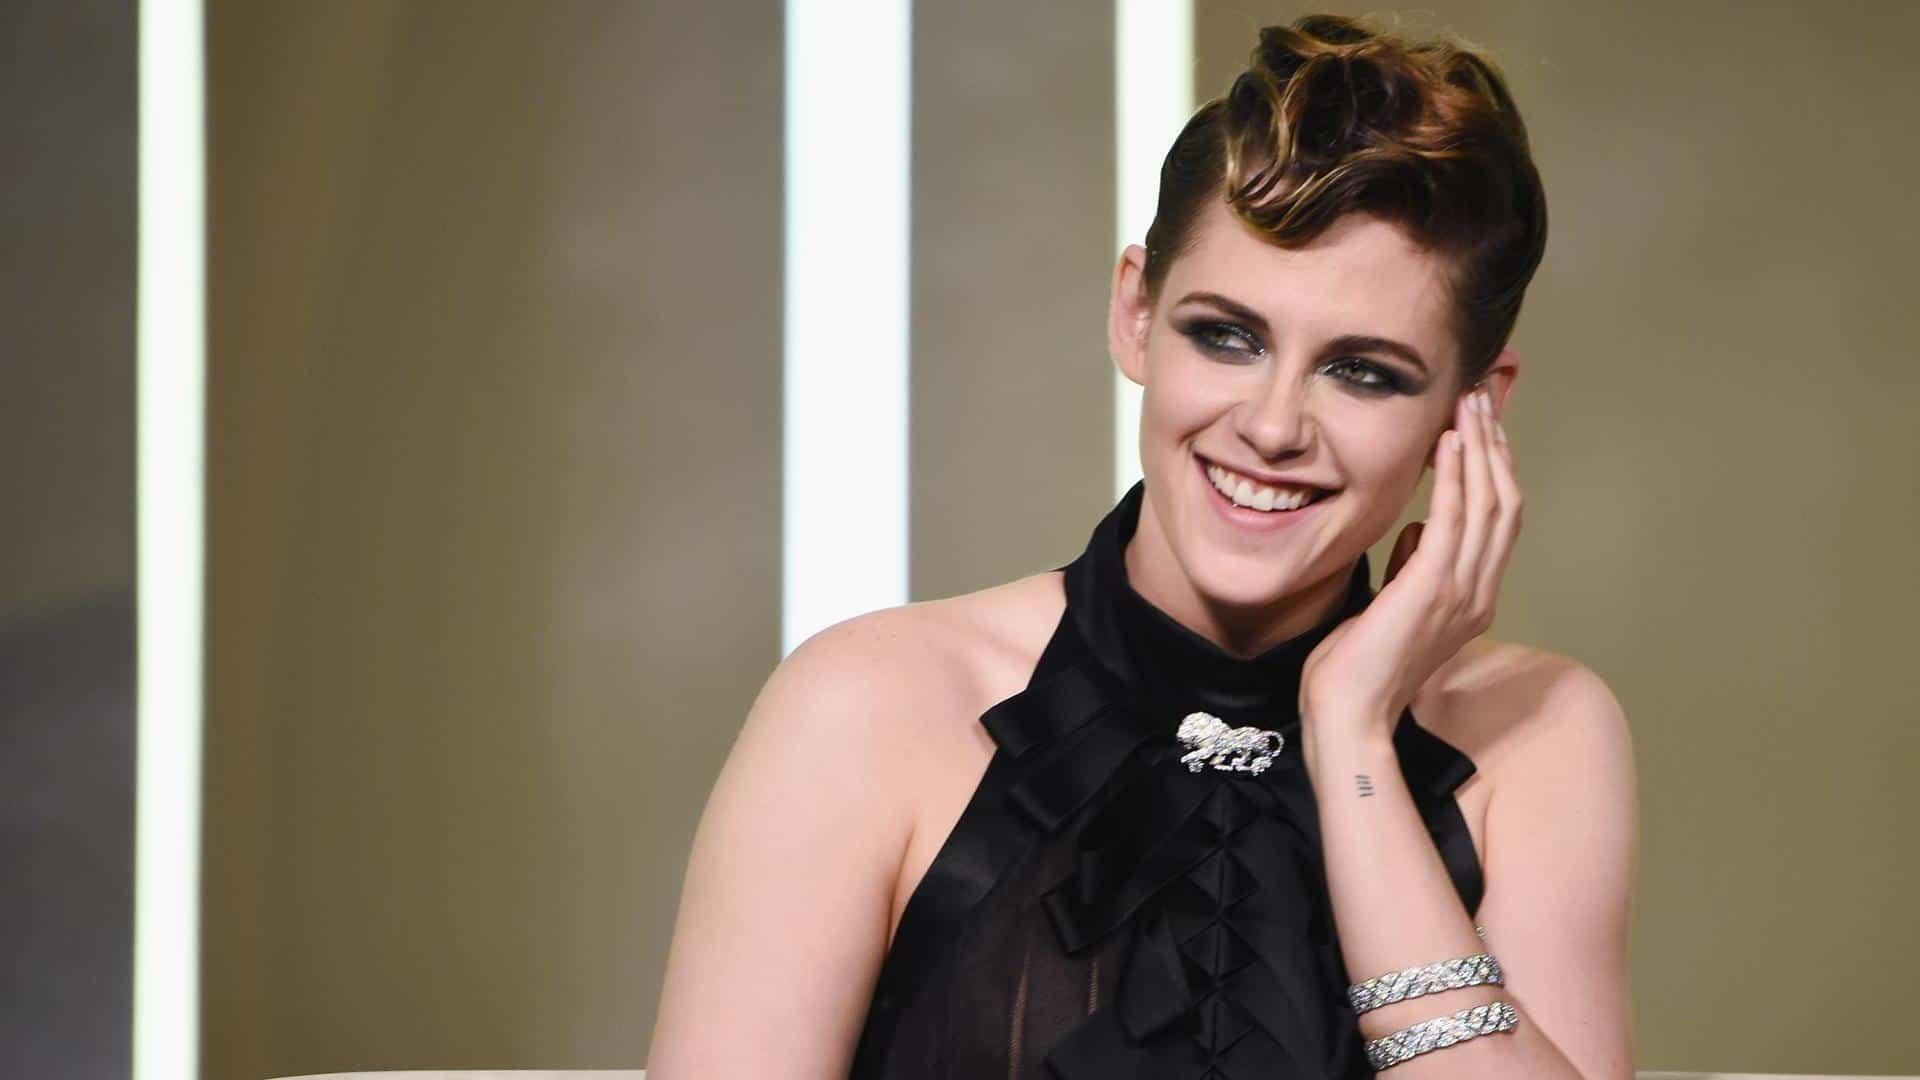 2018 Cannes Film Festival Kristen Stewart Wallpapers - La primera película dirigida por Kristen Stewart tendrá una protagonista bisexual